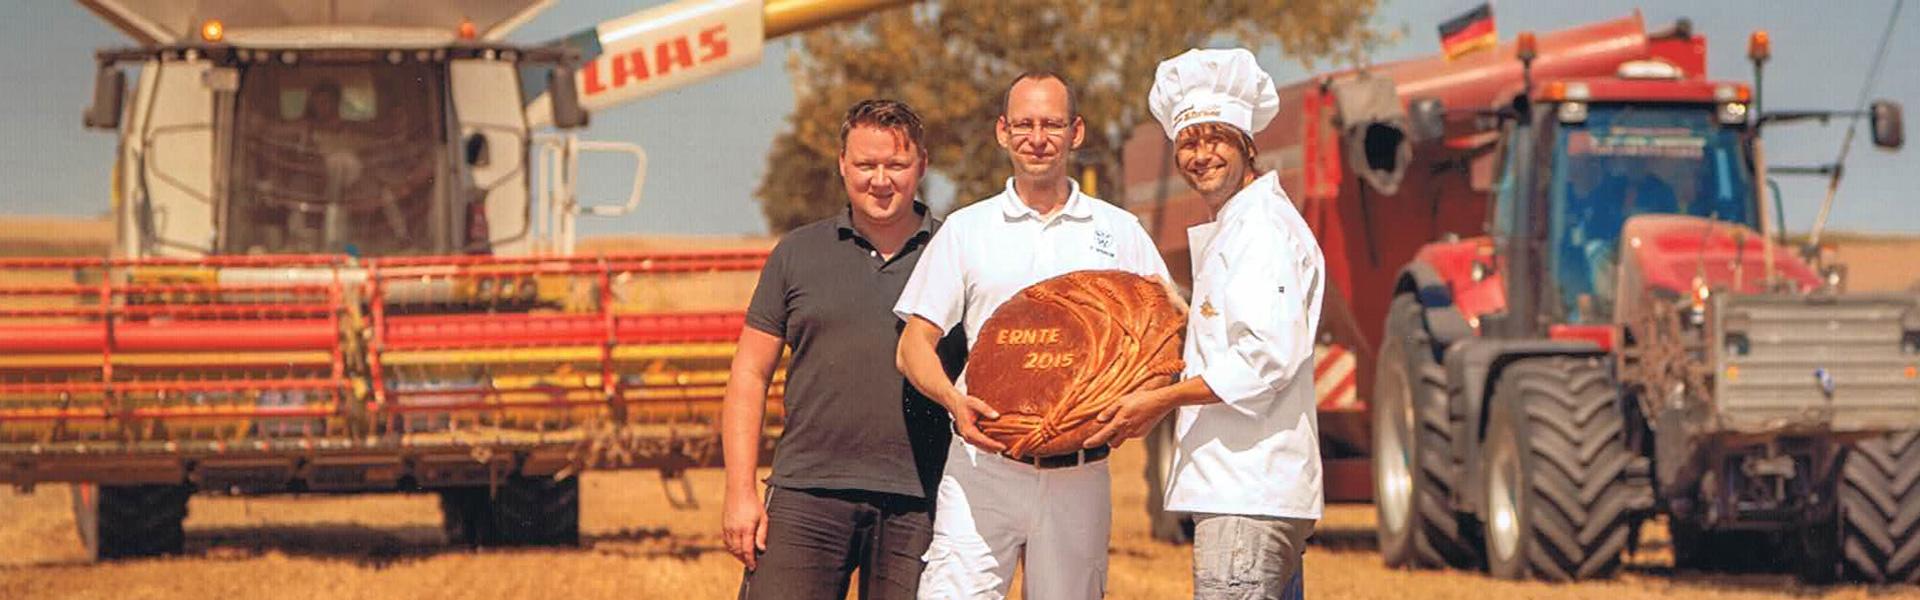 Tradition aus Leidenschaft - Bäckerei Körner